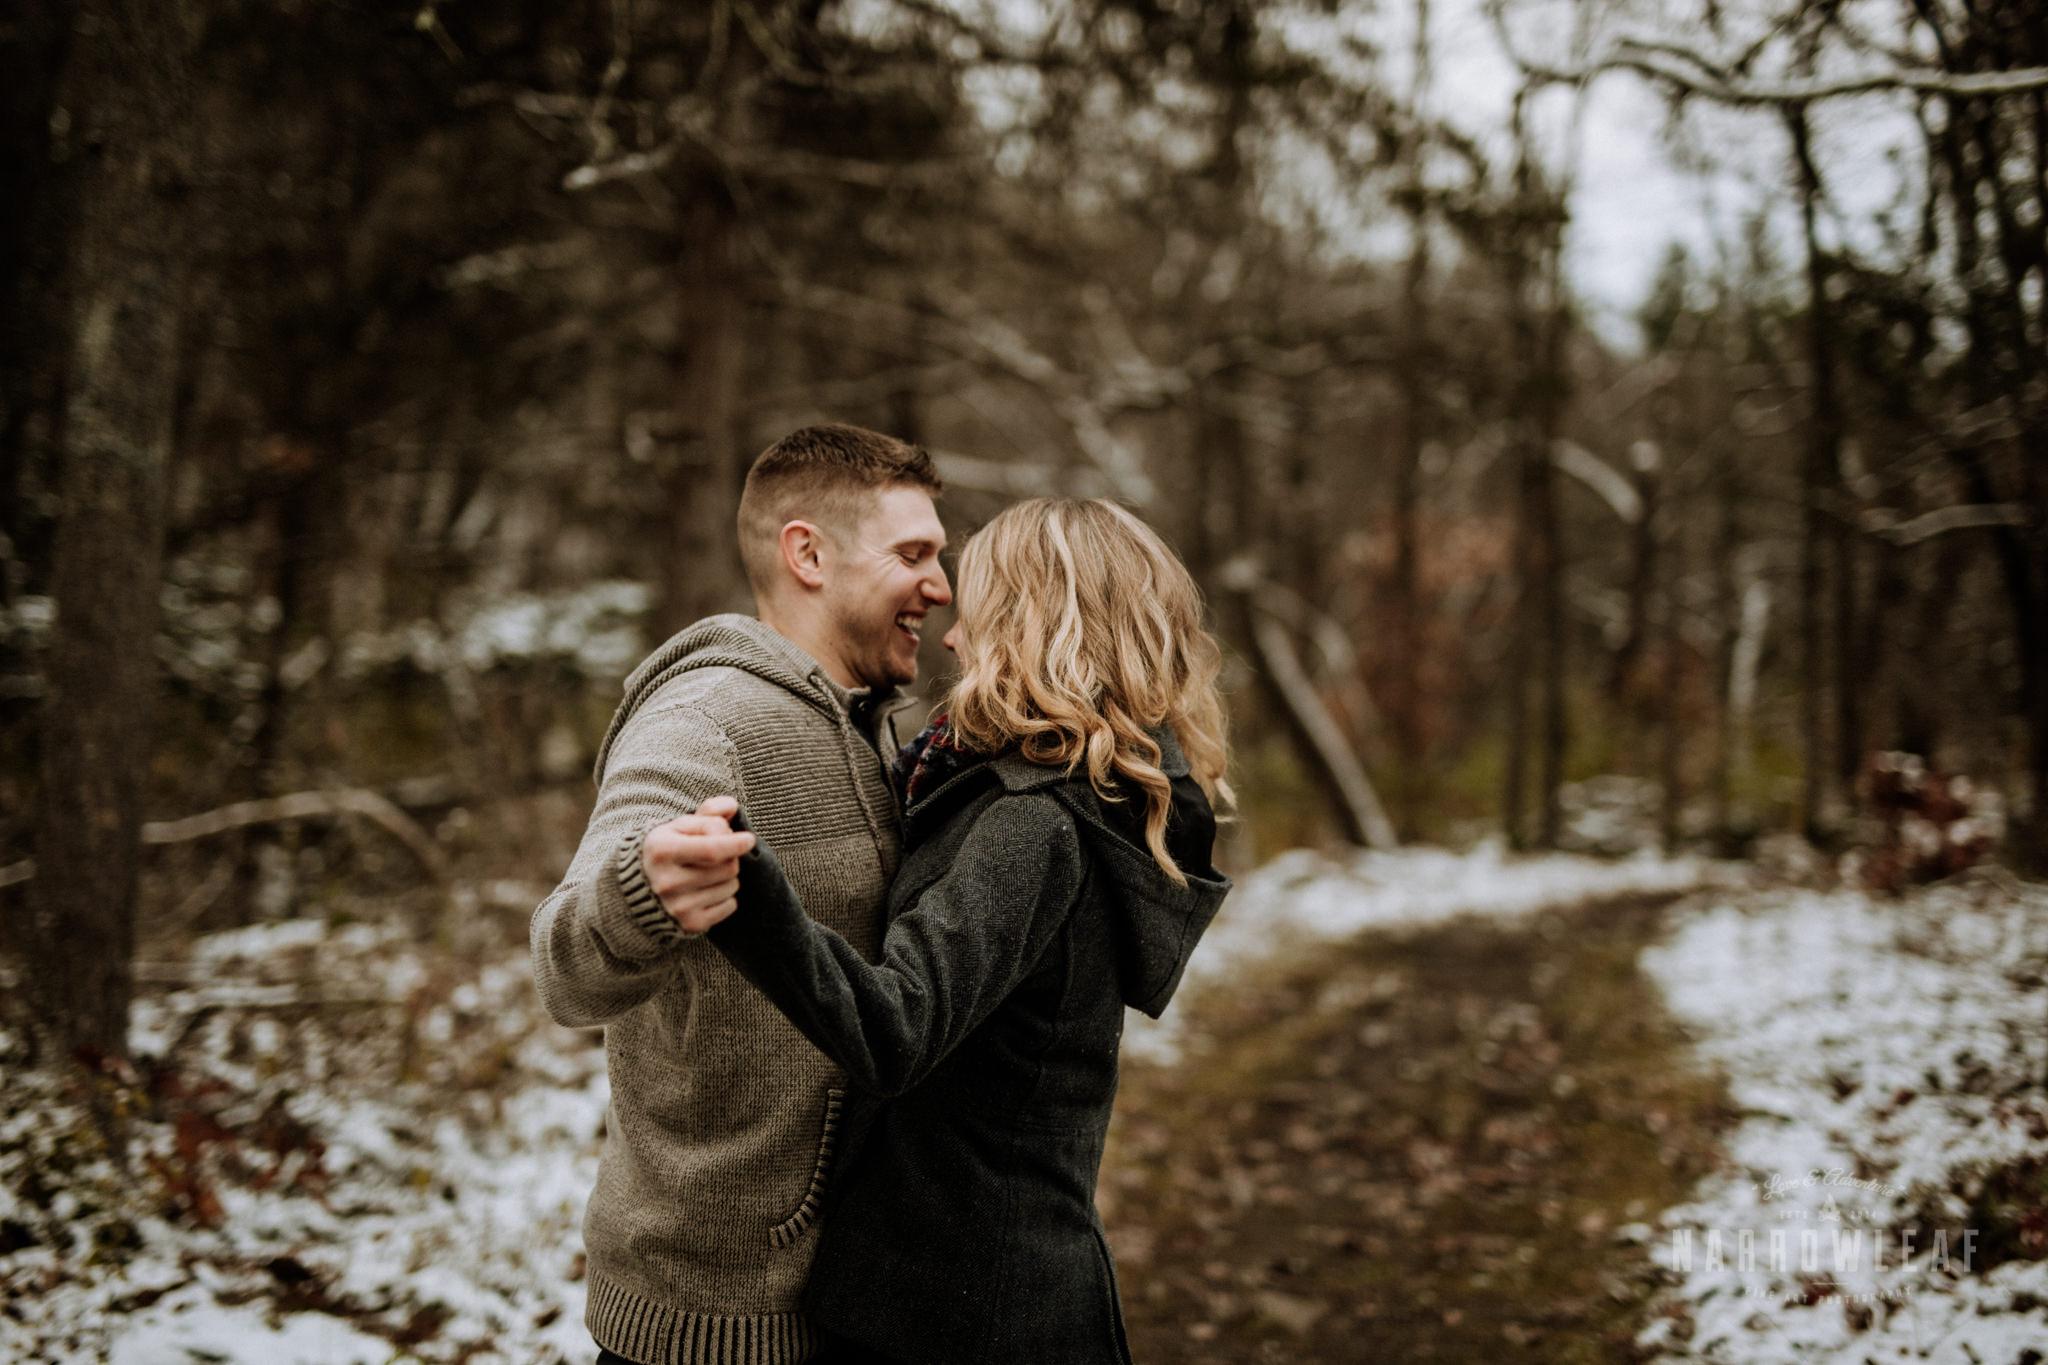 minnesota-winter-engagement-photos-Narrowleaf_Love_and_Adventure_Photography-1806.jpg